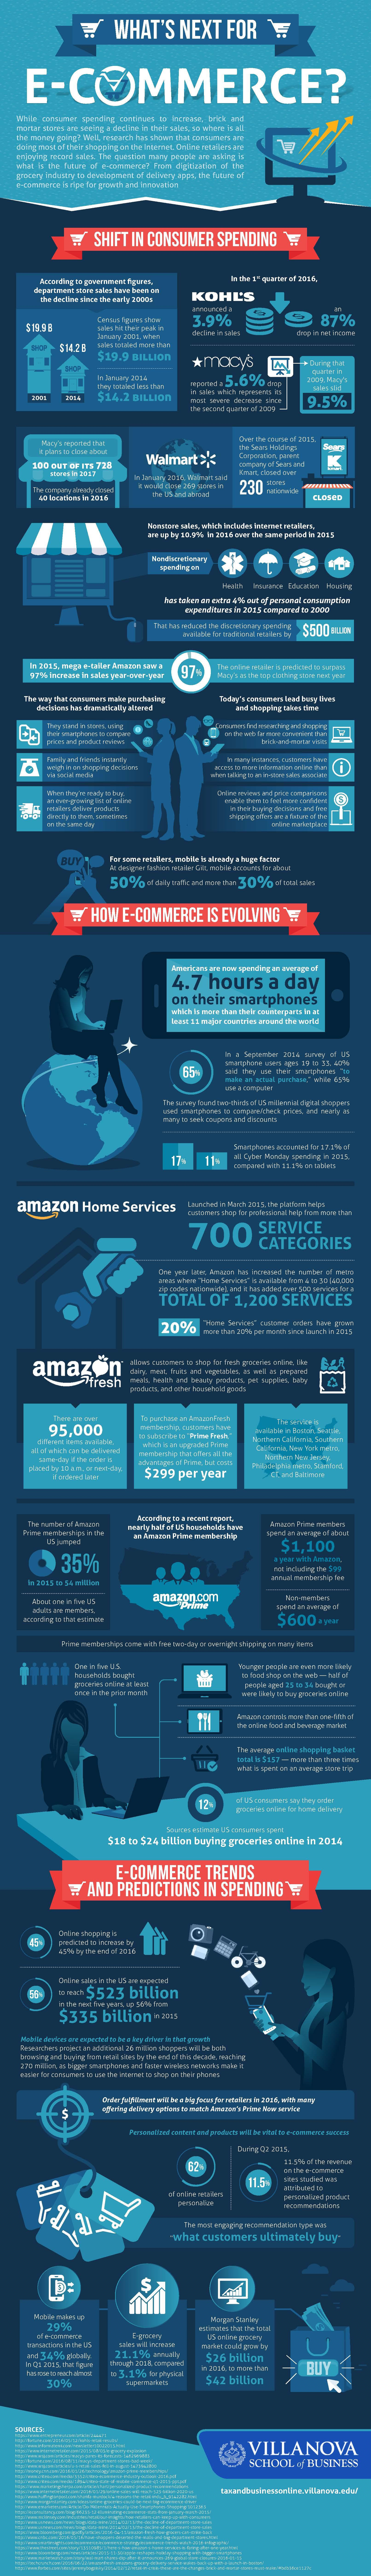 shift-in-consumer-spending-whats-next-for-e-commerce-ig